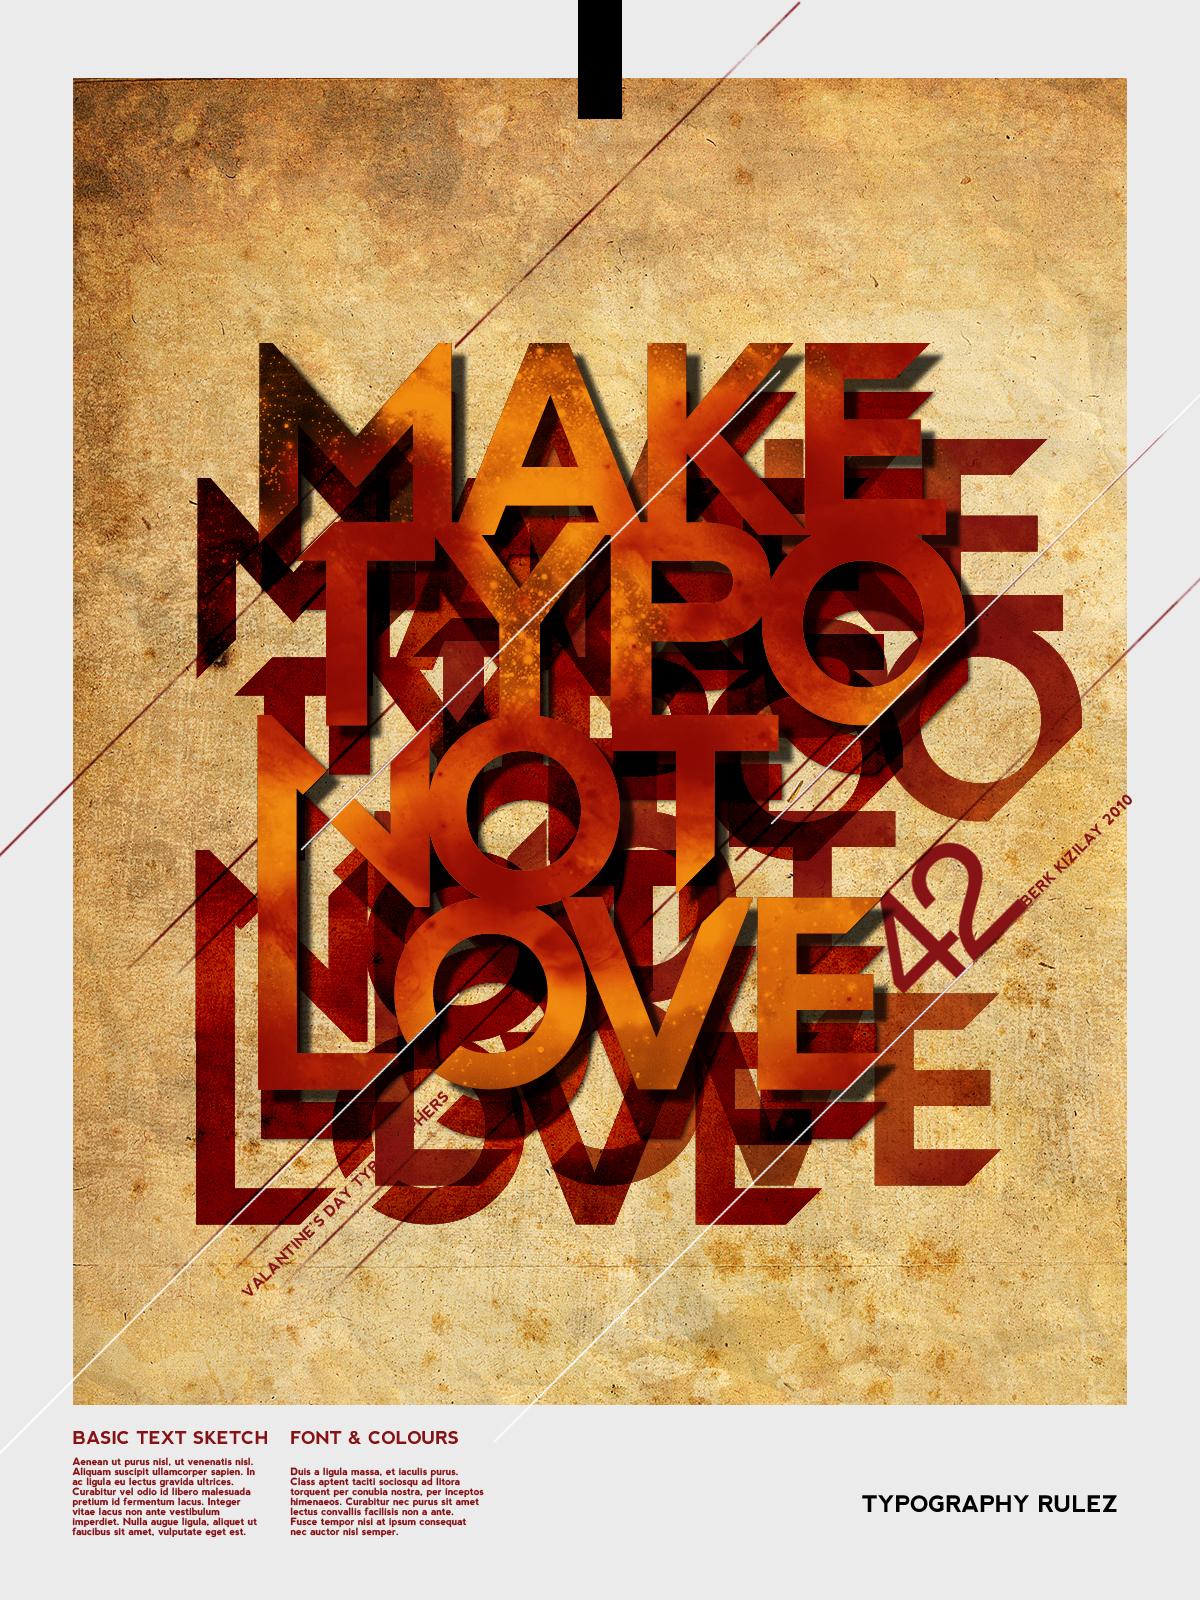 MAKE TYPO NOT LOVE